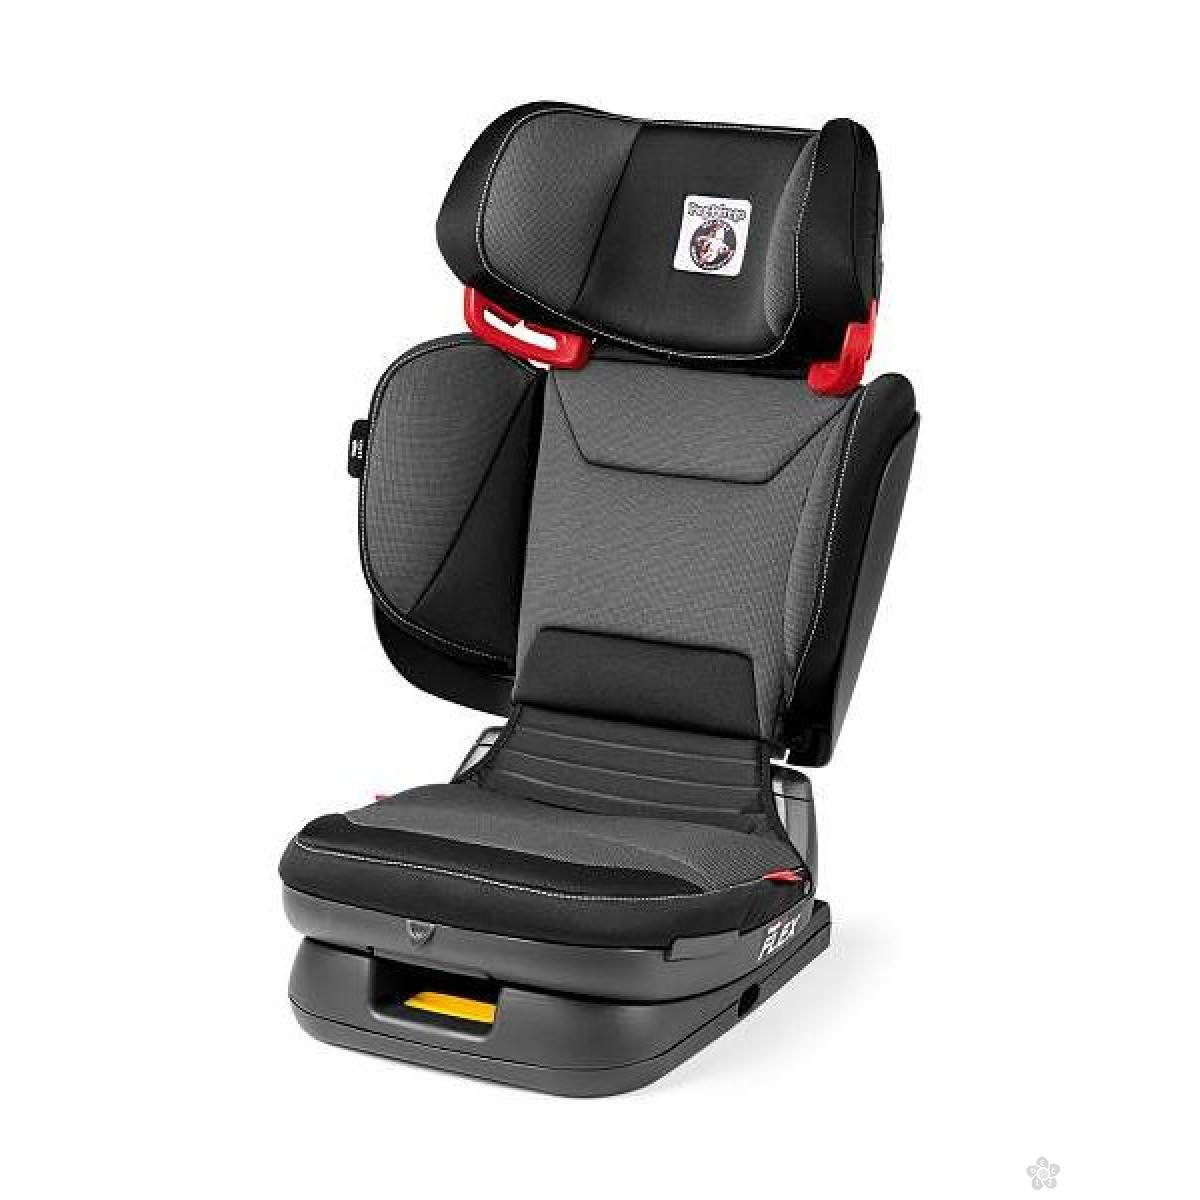 Auto Sedište Viaggio 2-3 Flex Crystal Balck P3810051532